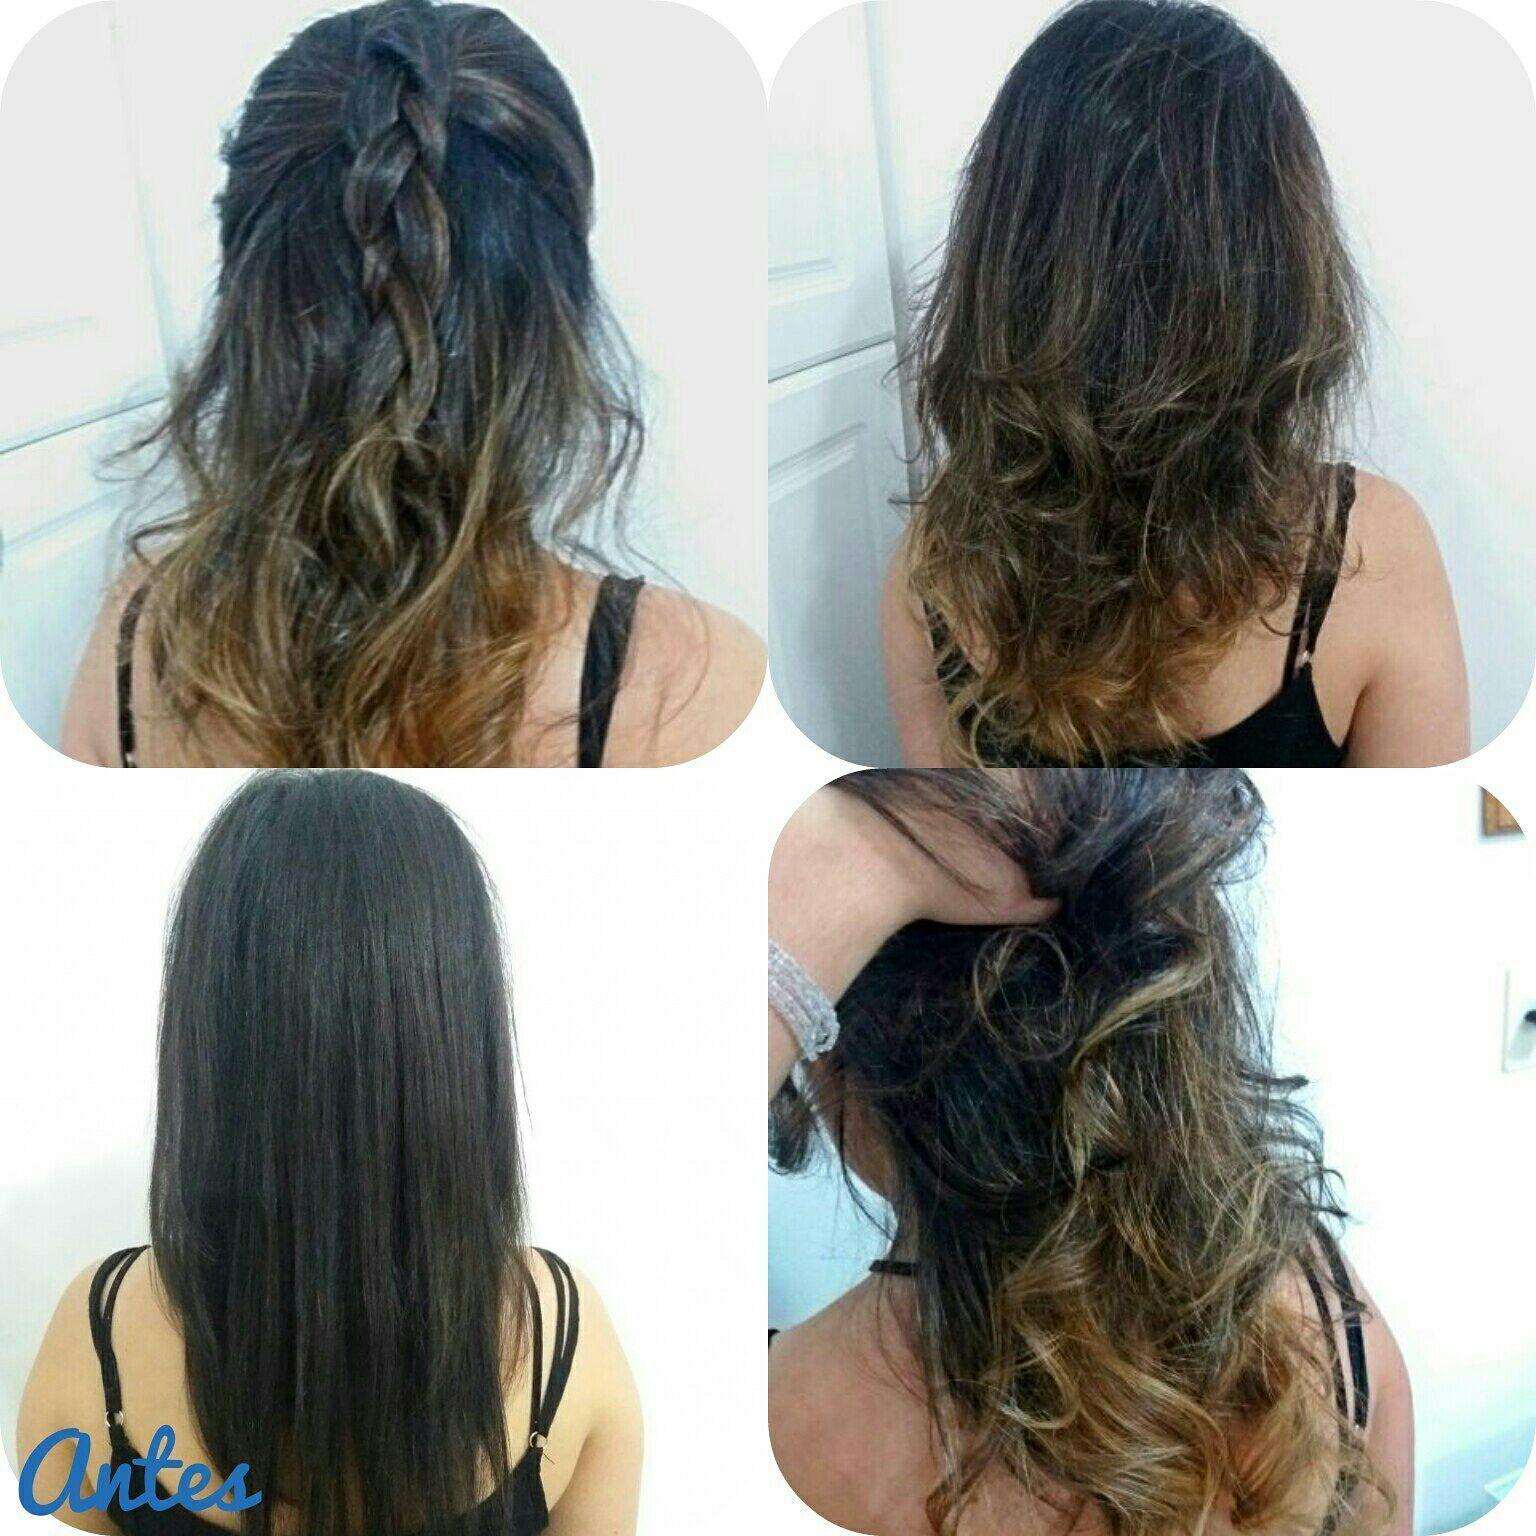 Ombrée hair cabelo maquiador(a) auxiliar cabeleireiro(a) stylist / visagista